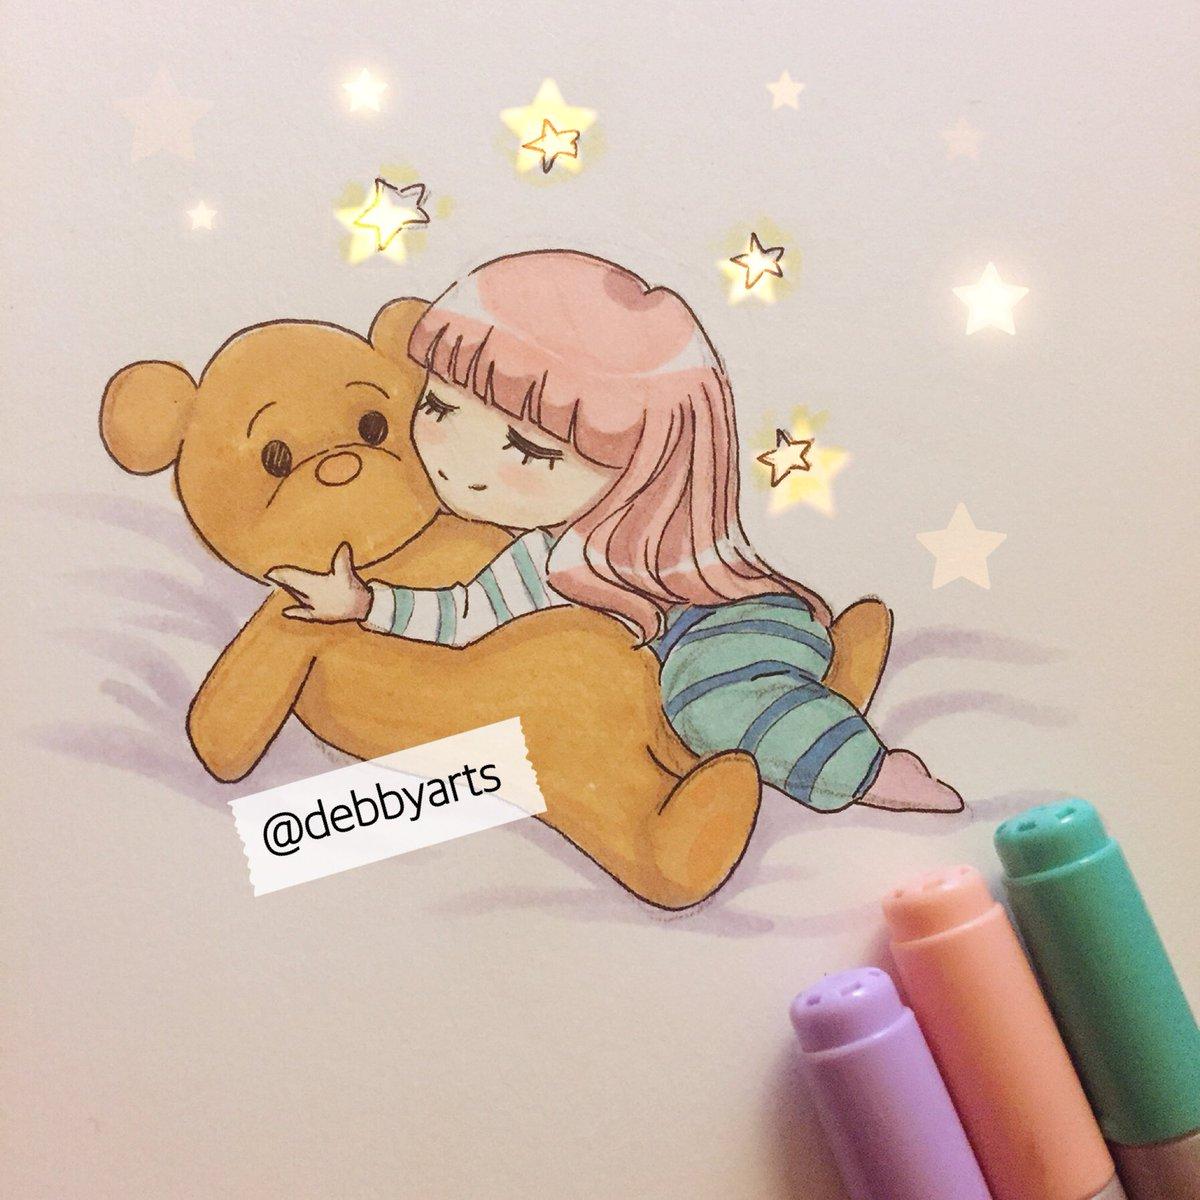 e b b y on twitter night debbyarts drawing art